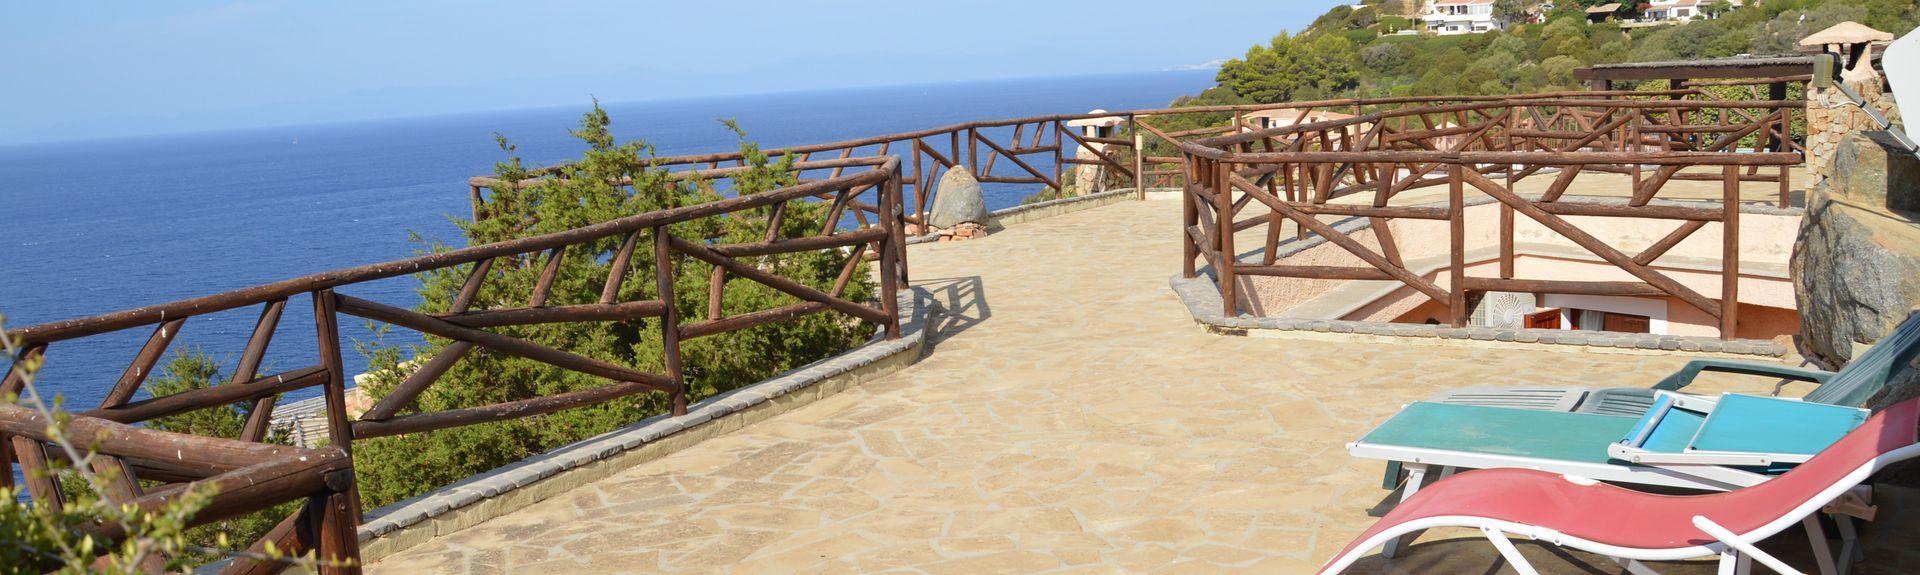 Plaża Colostrai, Muravera, Sardynia, Włochy